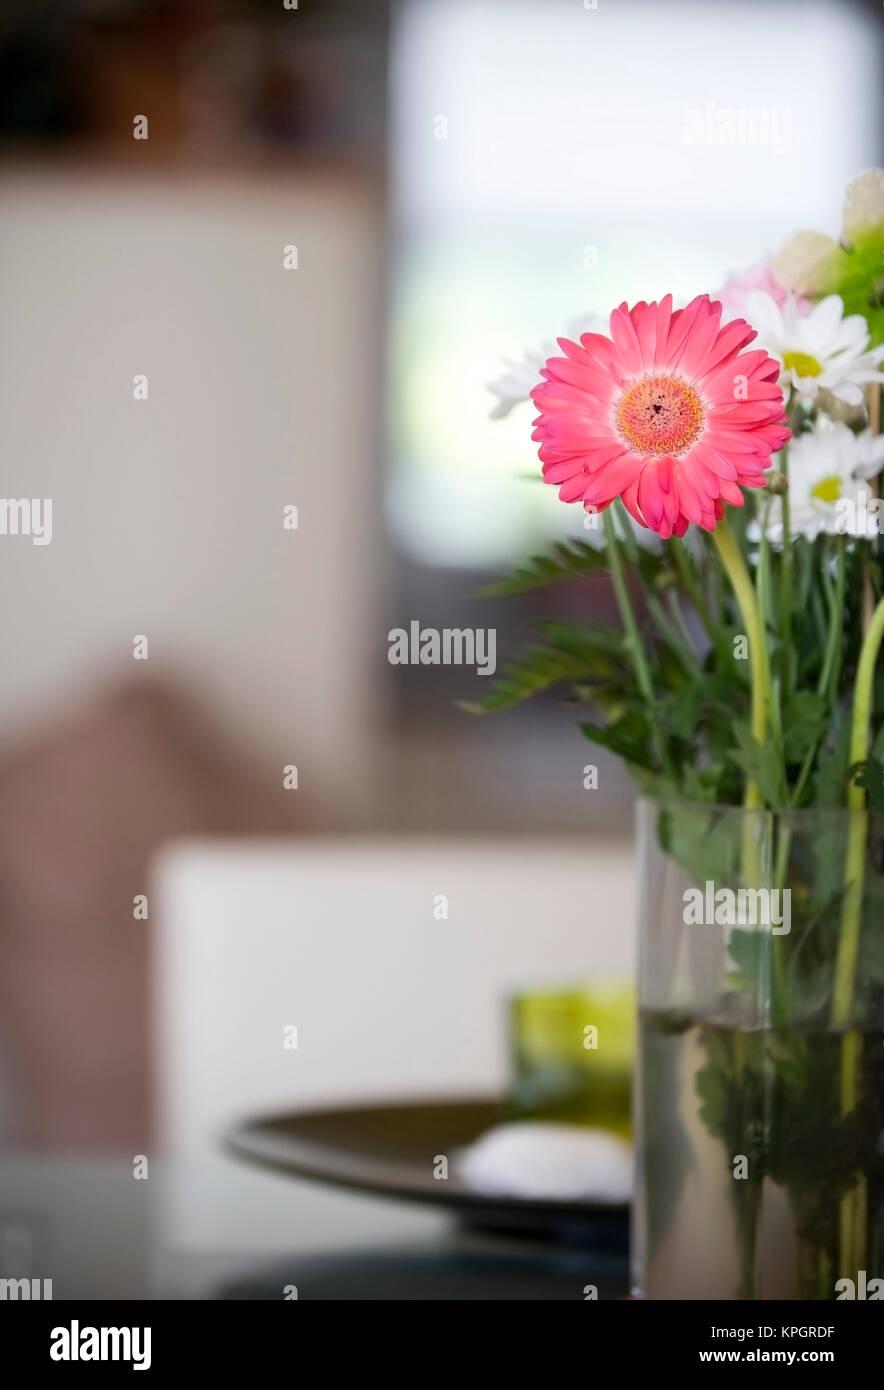 Blumenvase mit Gerbera im Wohnraum - flower vase with gerbera in living room Stock Photo